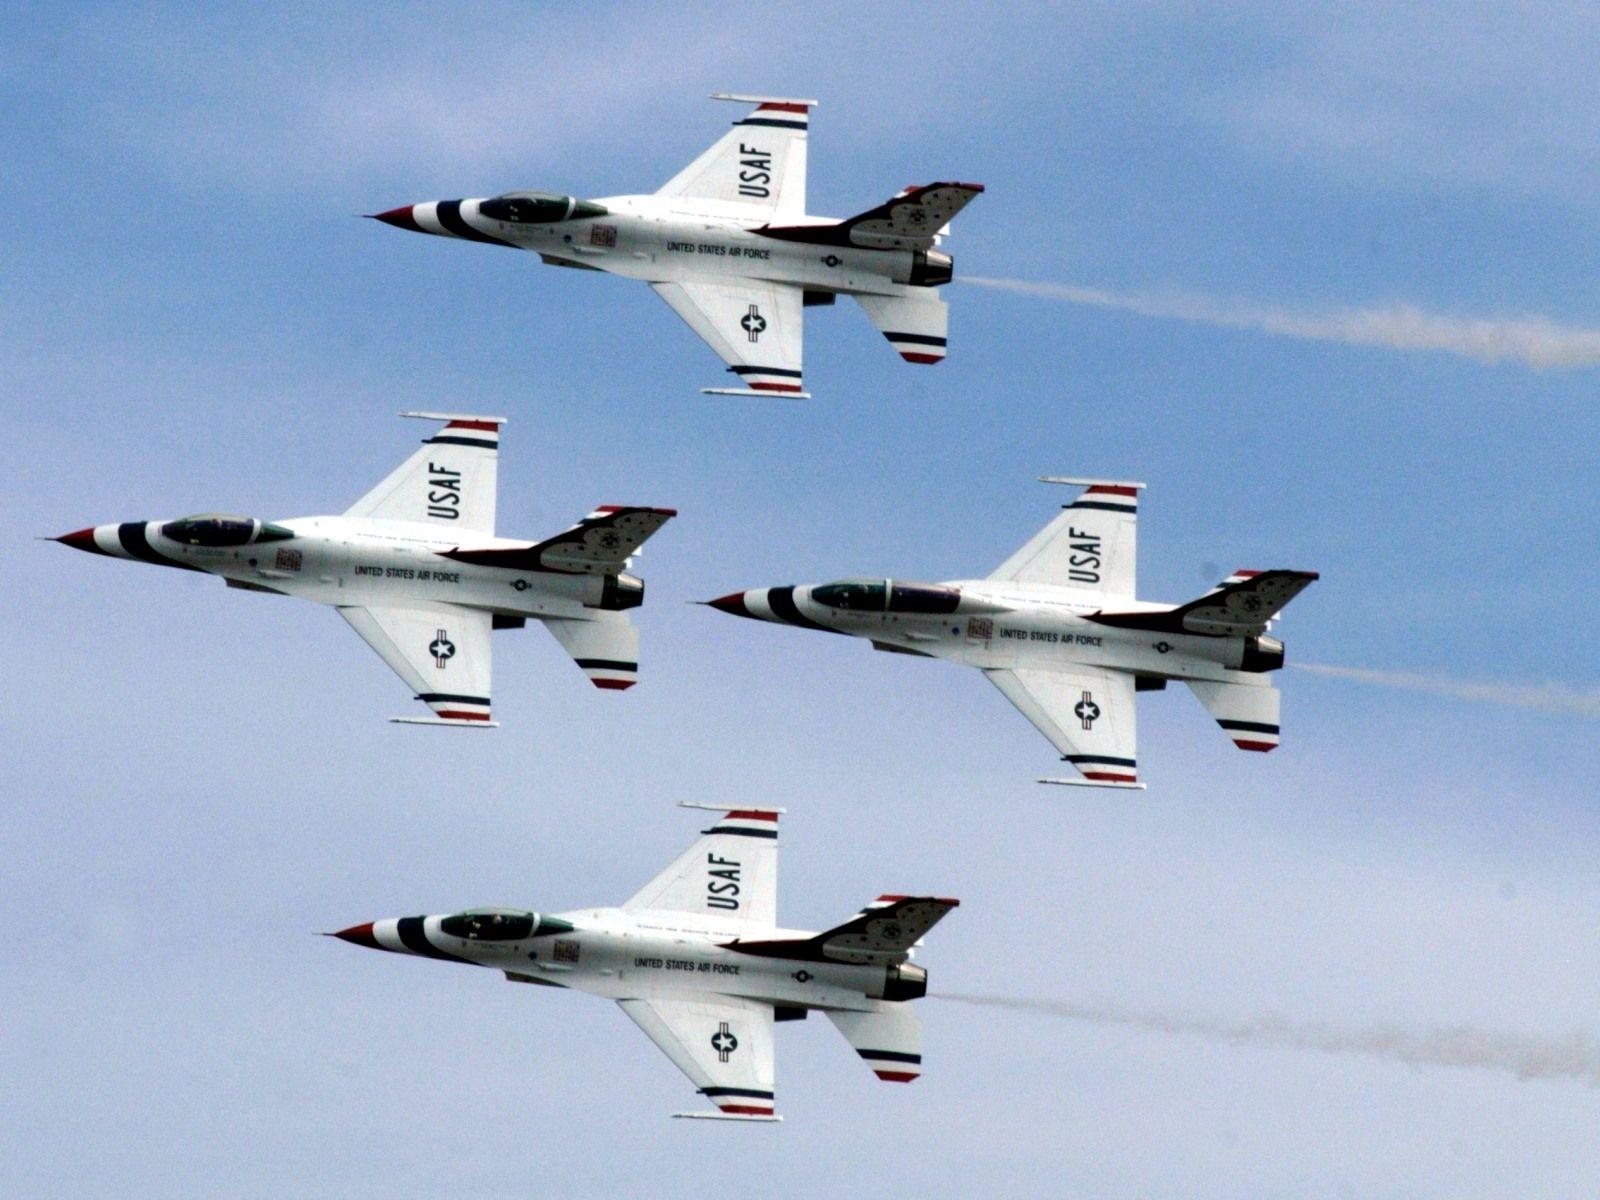 Air force planes photos Russia - Air Force Photos t